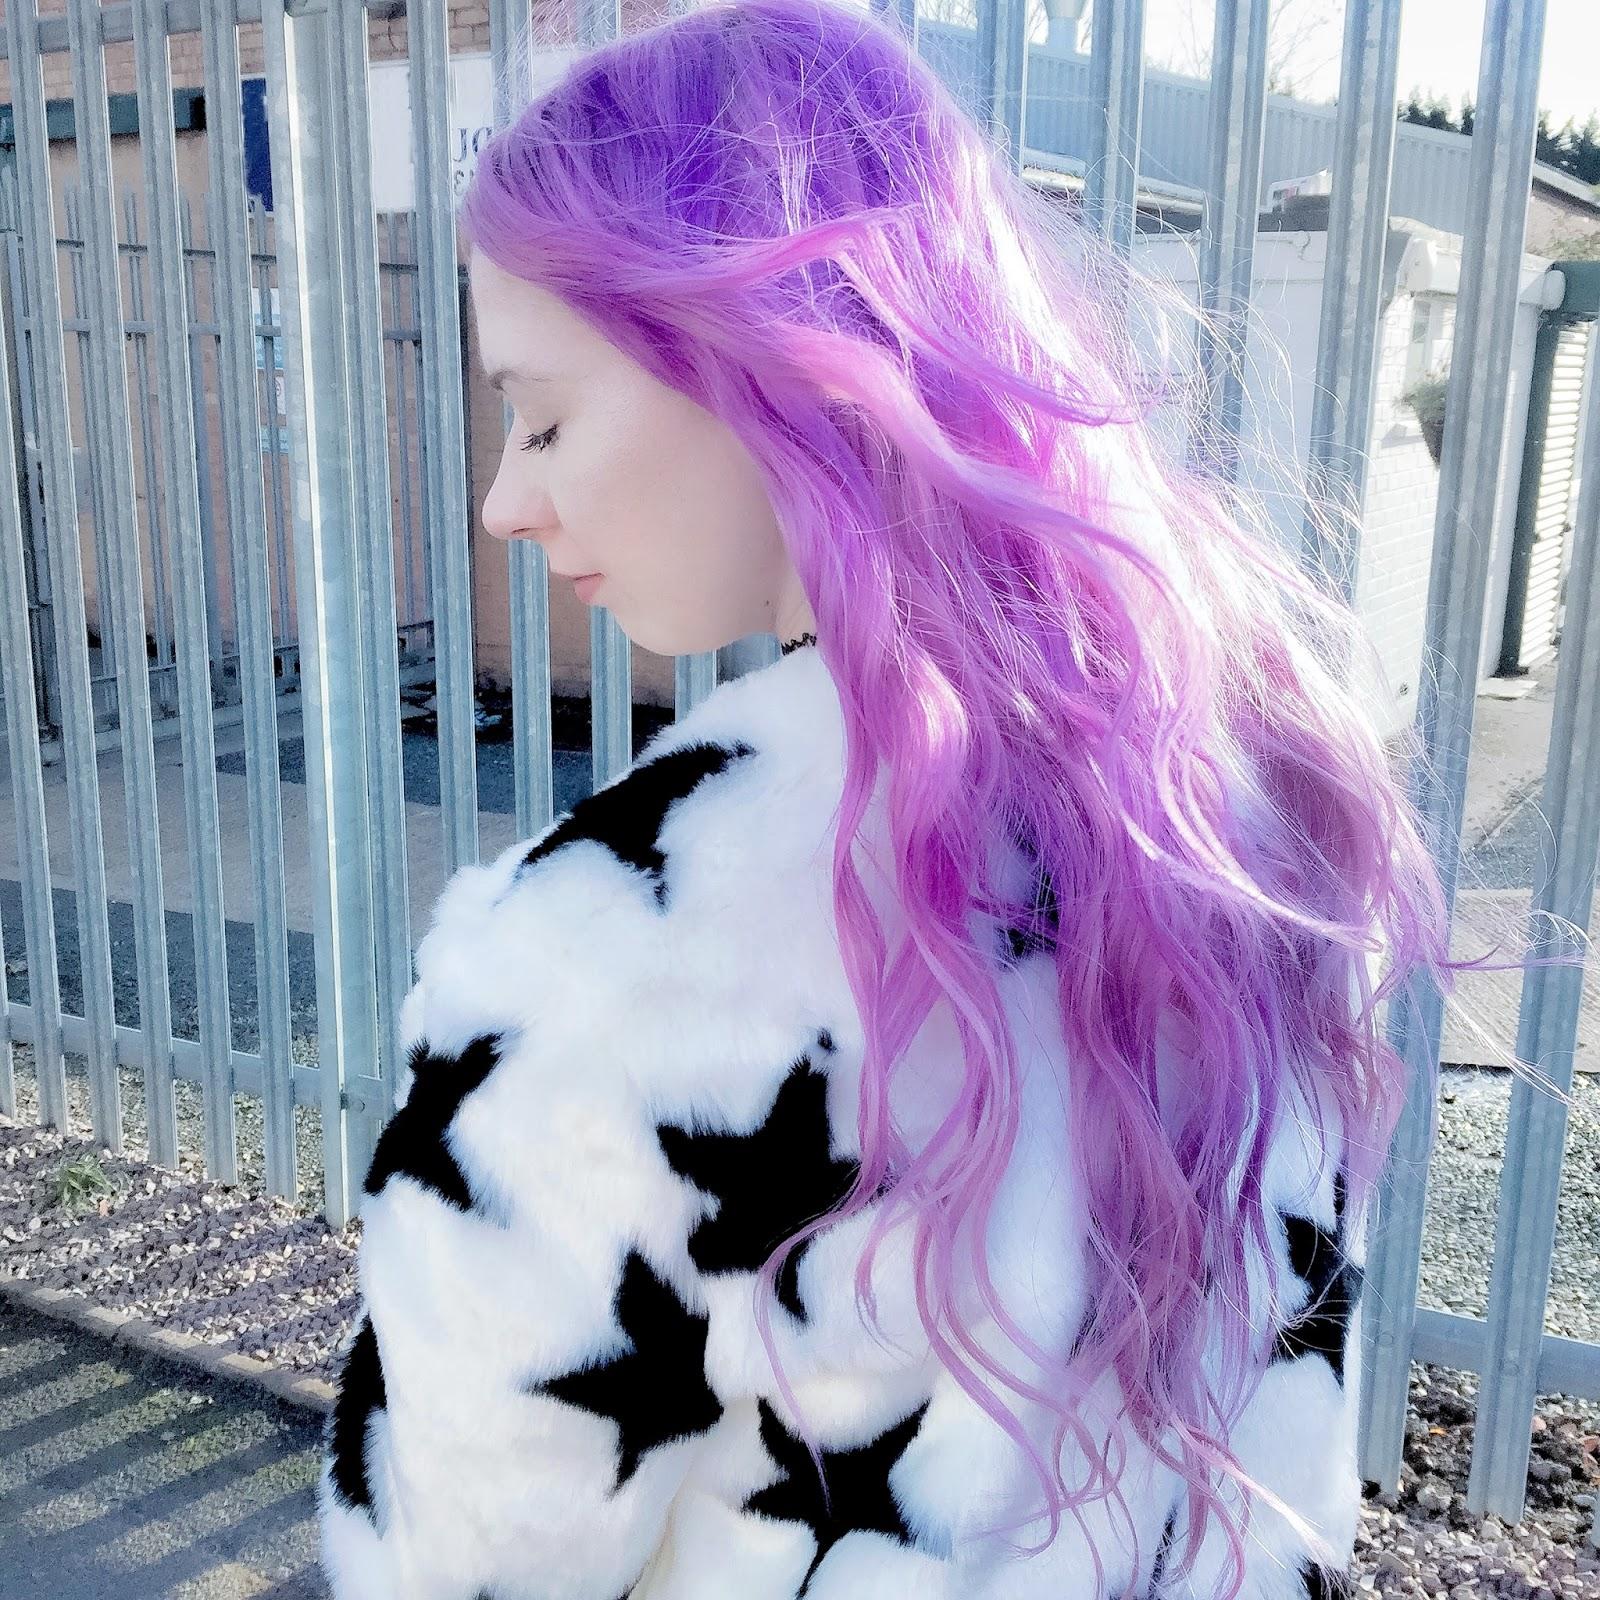 PURPLE HAIR AND FLUFFY STAR FAUX FUR